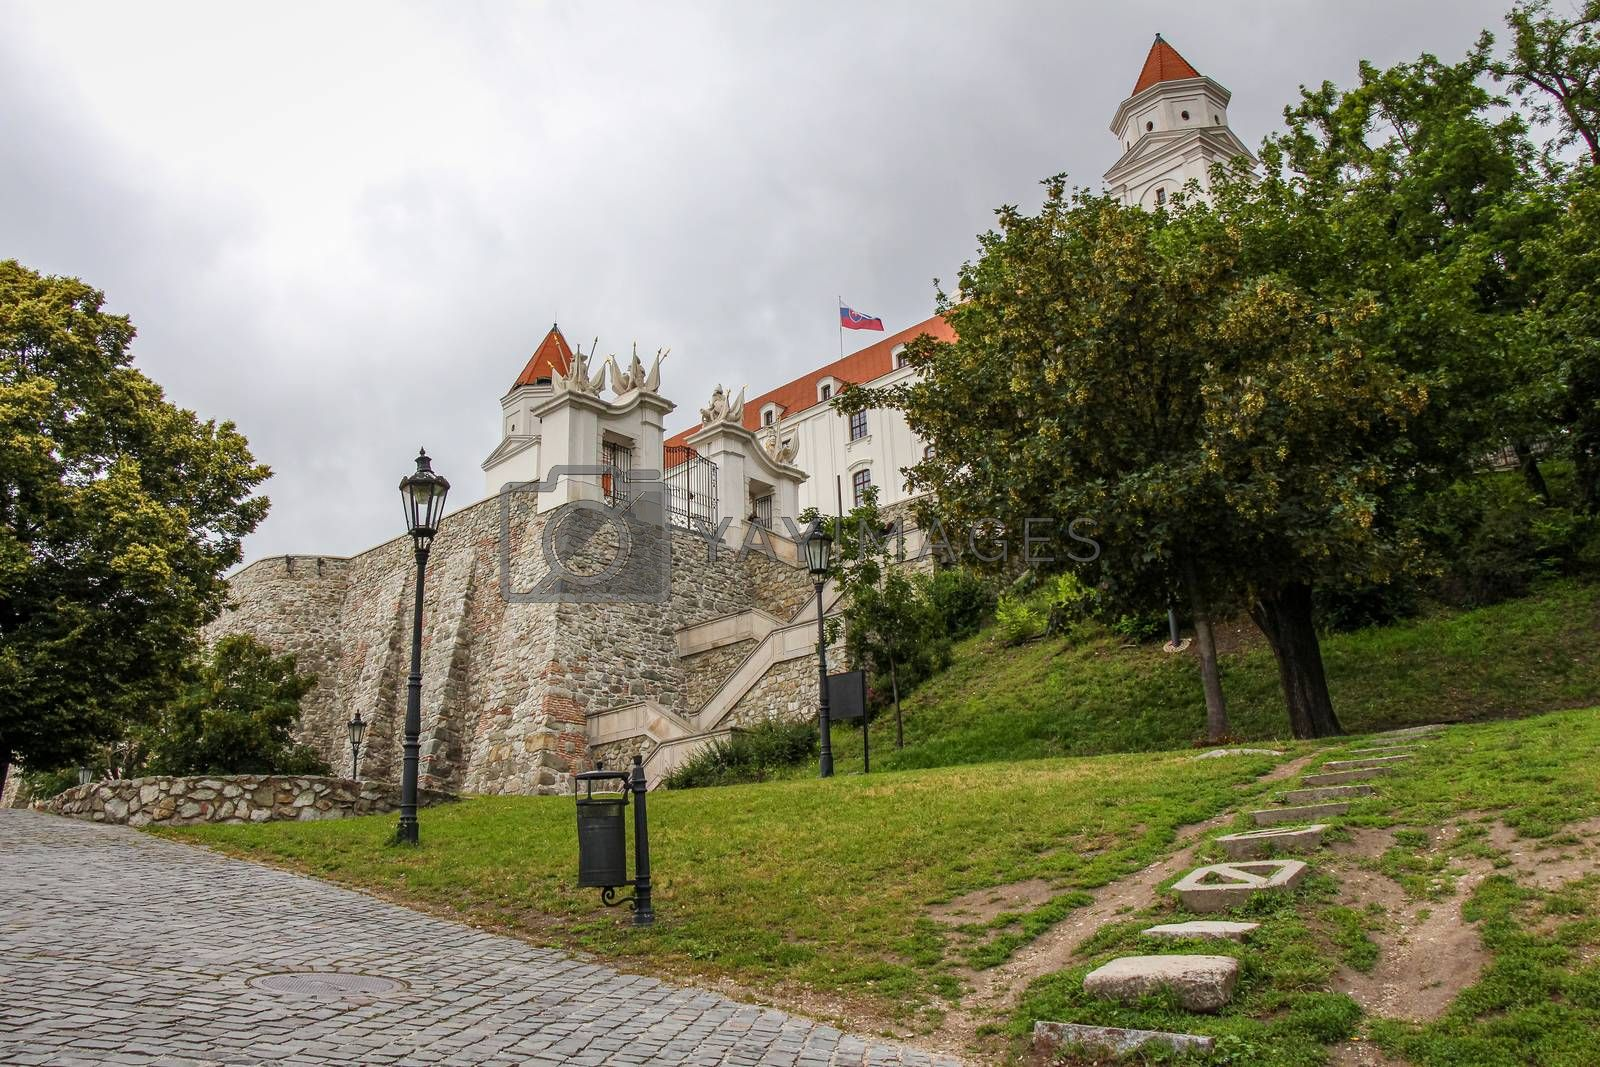 The park at the base of the steps at Bratislava Castle, Bratislava, Slovakia